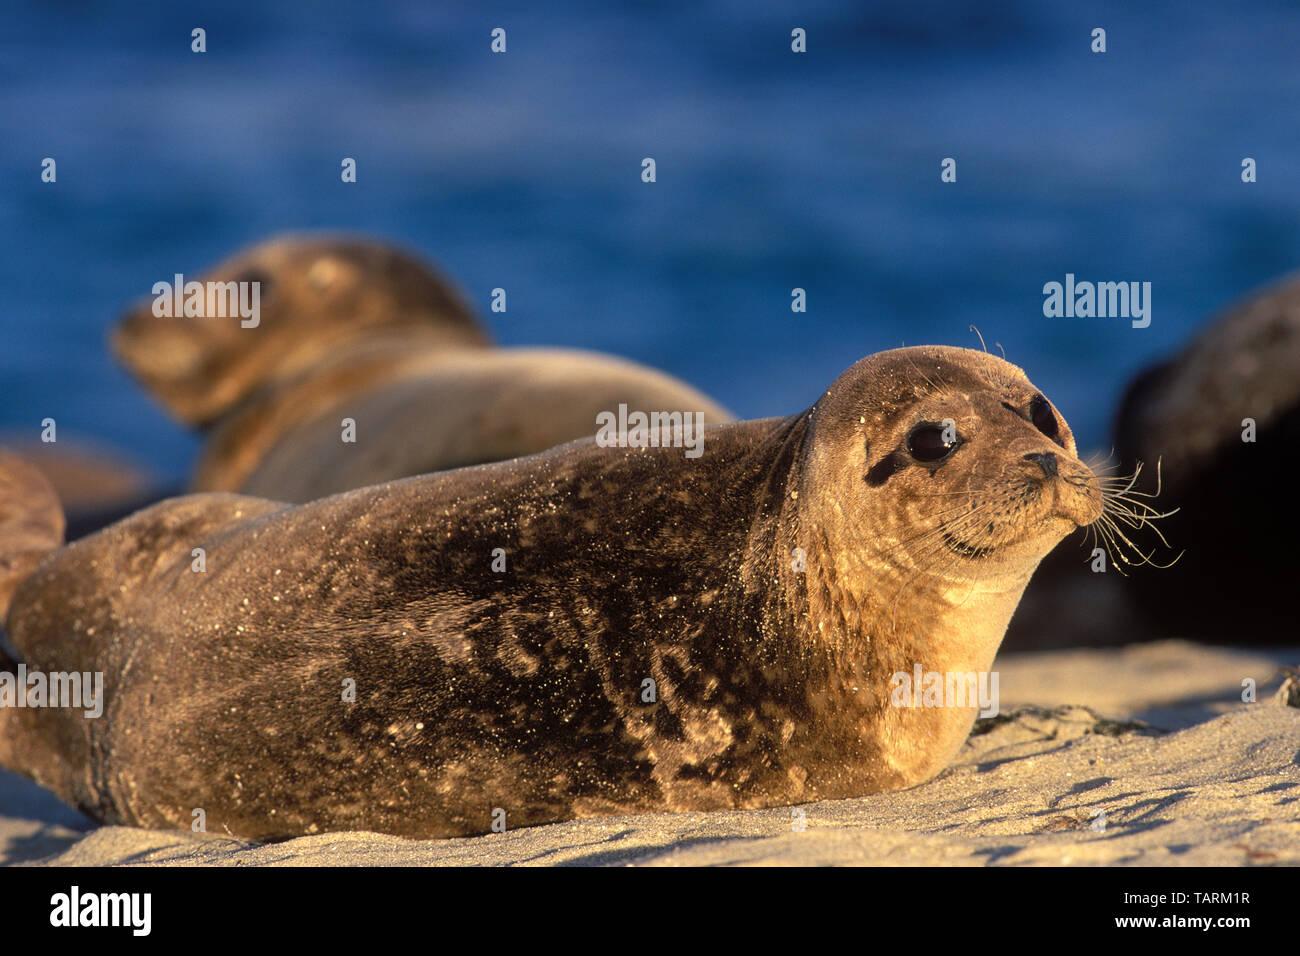 Harbor Seal - Phoca vitulina Resting on a beach, La Jolla, San Diego County, California - Stock Image